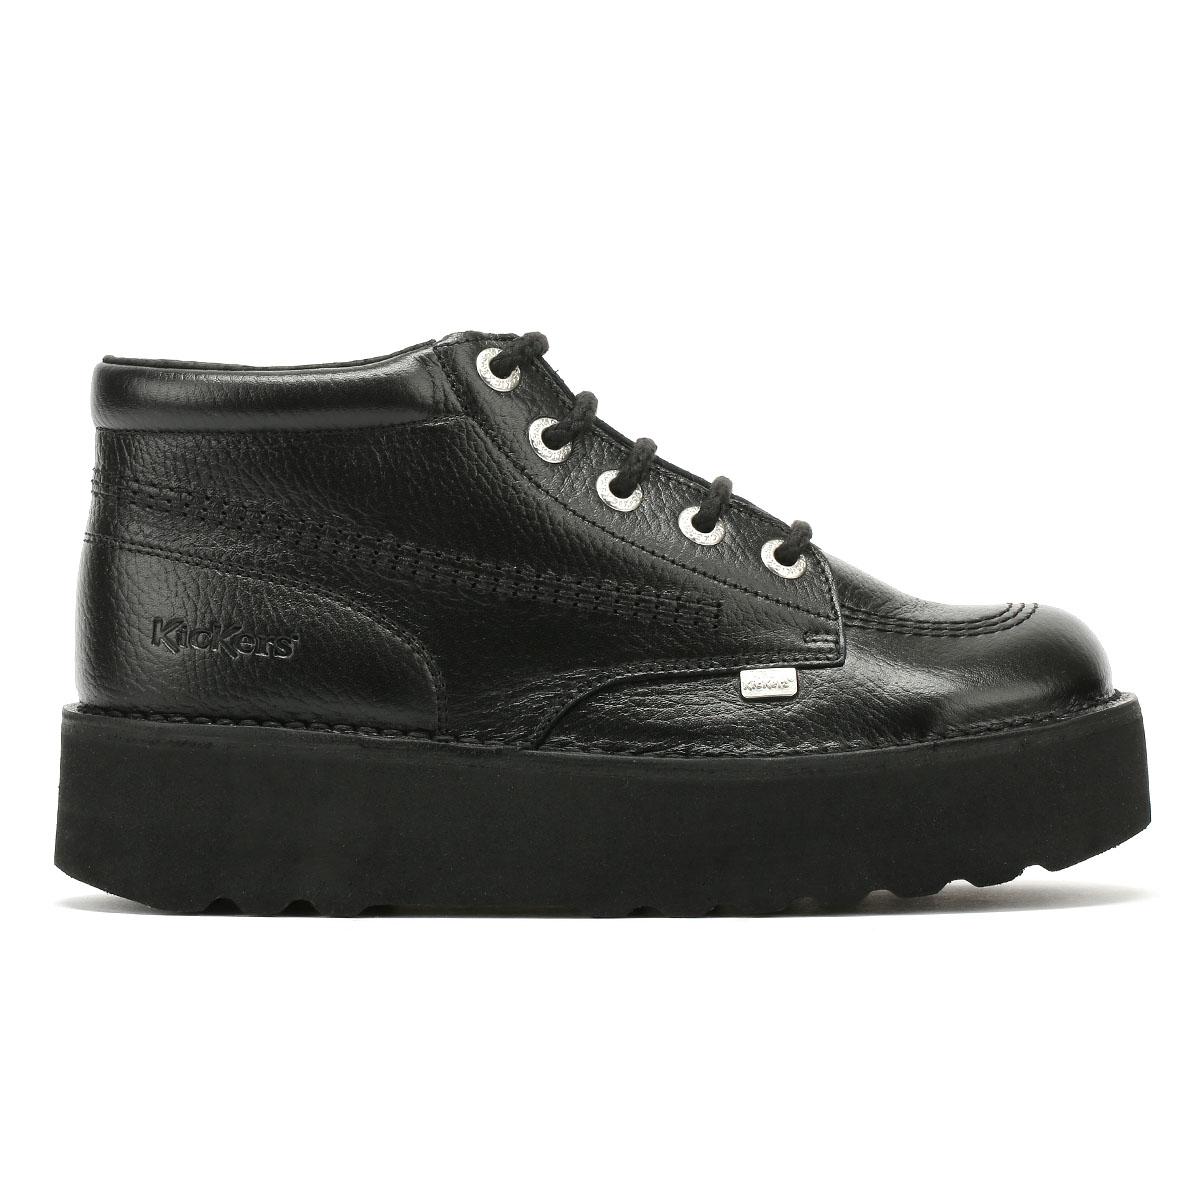 Kickers Kick Hi Womens Black Leather Platform Boots Lace Up Casual Shoes